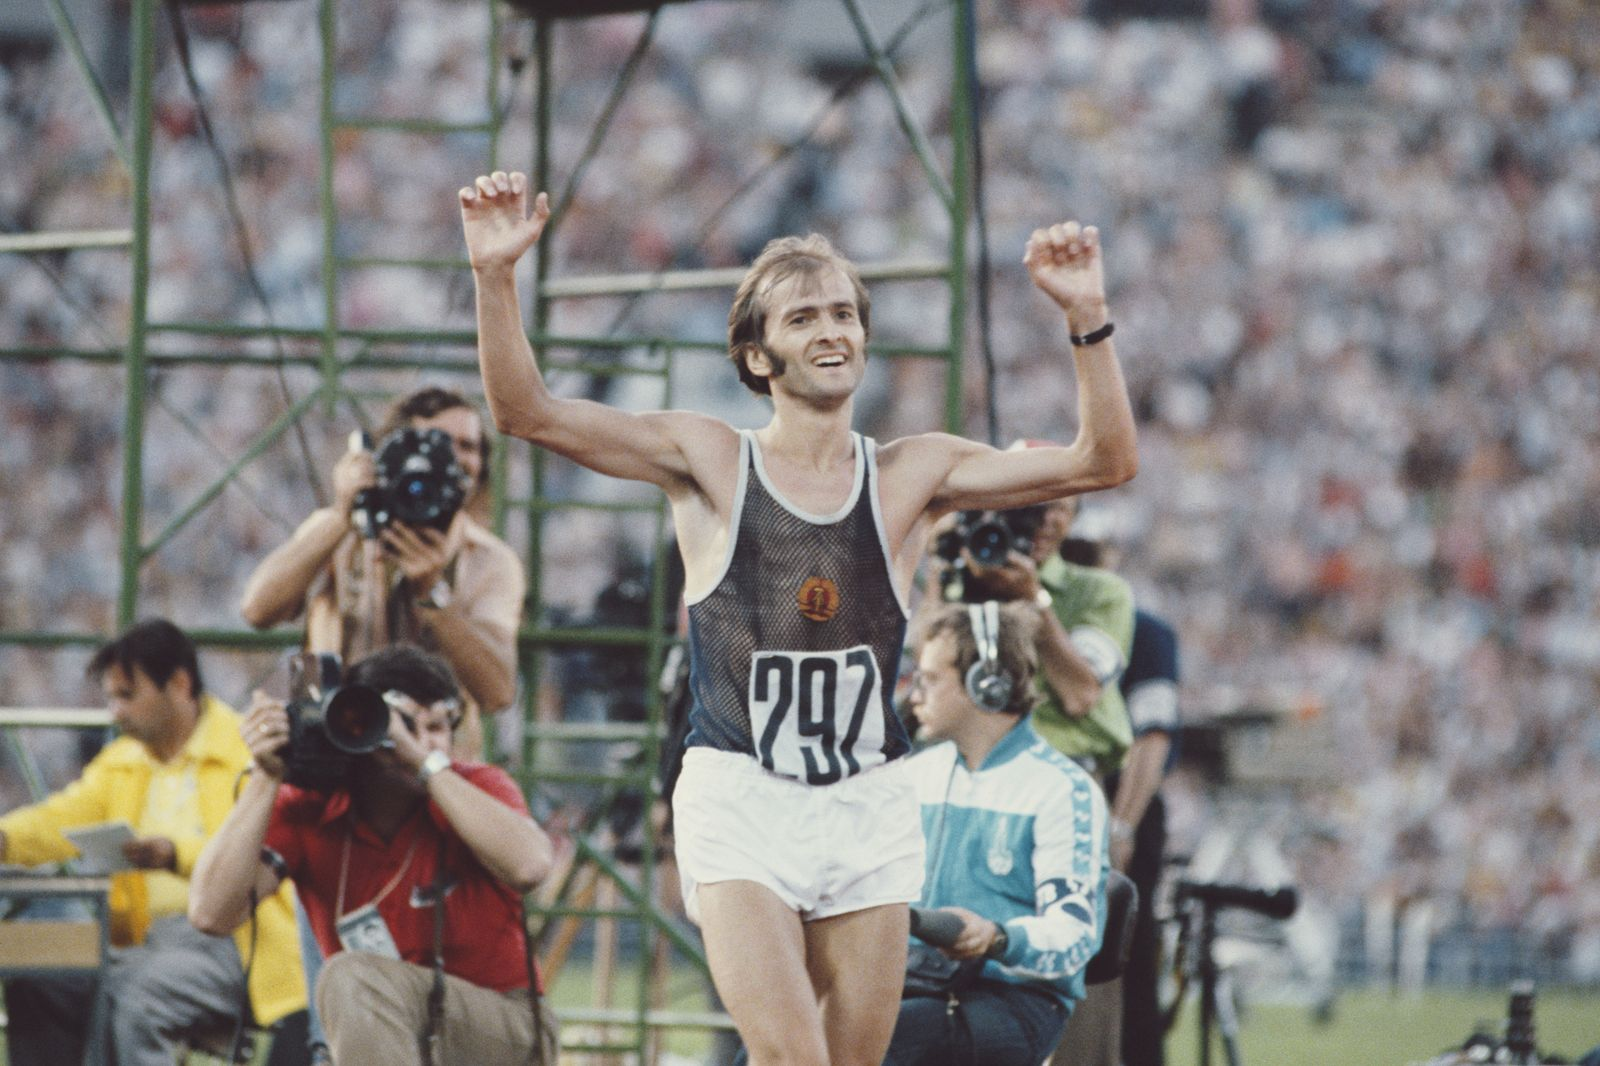 Marathon At XXII Summer Olympics